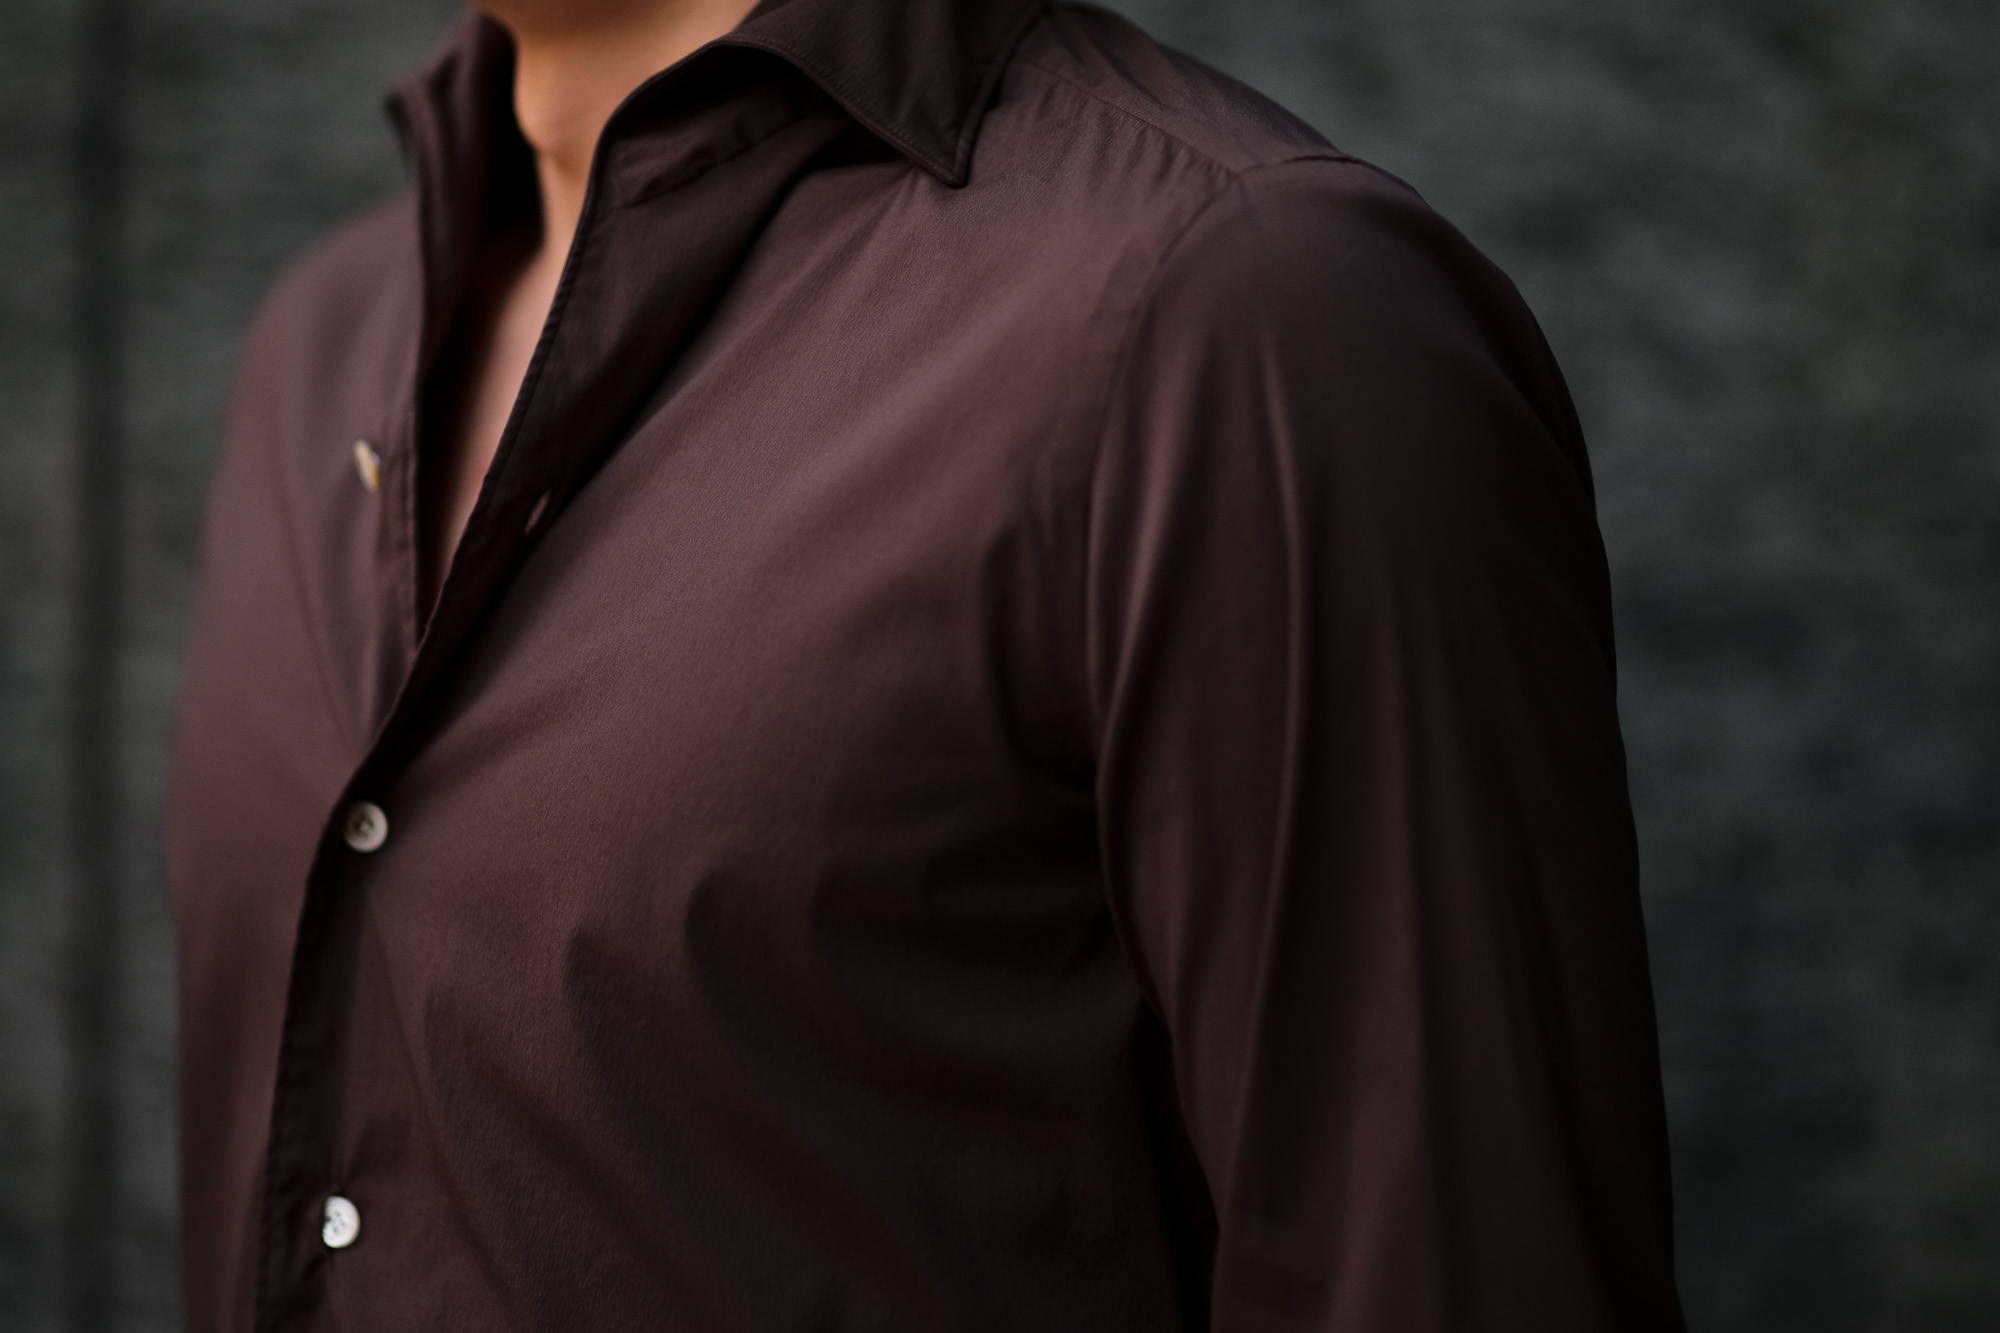 Finamore (フィナモレ) SEUL ITALIAN COLOR STRETCH COTTON SHIRTS ストレッチコットン ワンピースカラー シャツ BROWN (ブラウン) made in italy (イタリア製) 2020 春夏新作 愛知 名古屋 altoediritto アルトエデリット シャツ